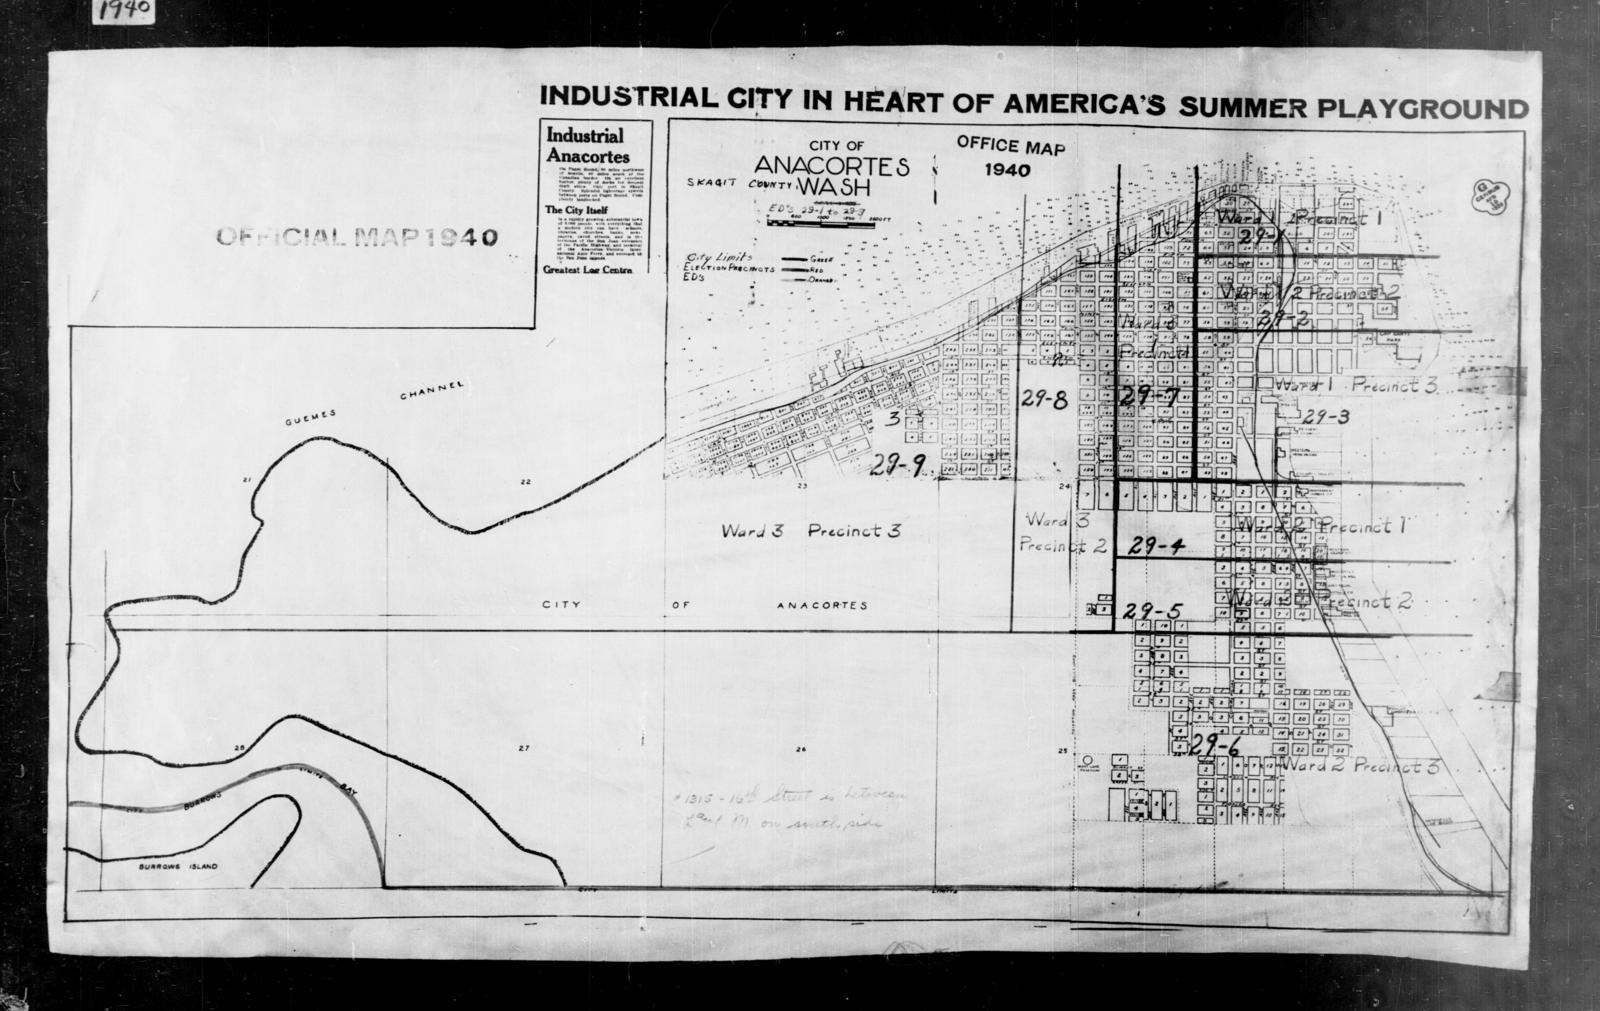 1940 Census Enumeration District Maps - Washington - Skagit County - Anacortes - ED 29-1 - ED 29-9